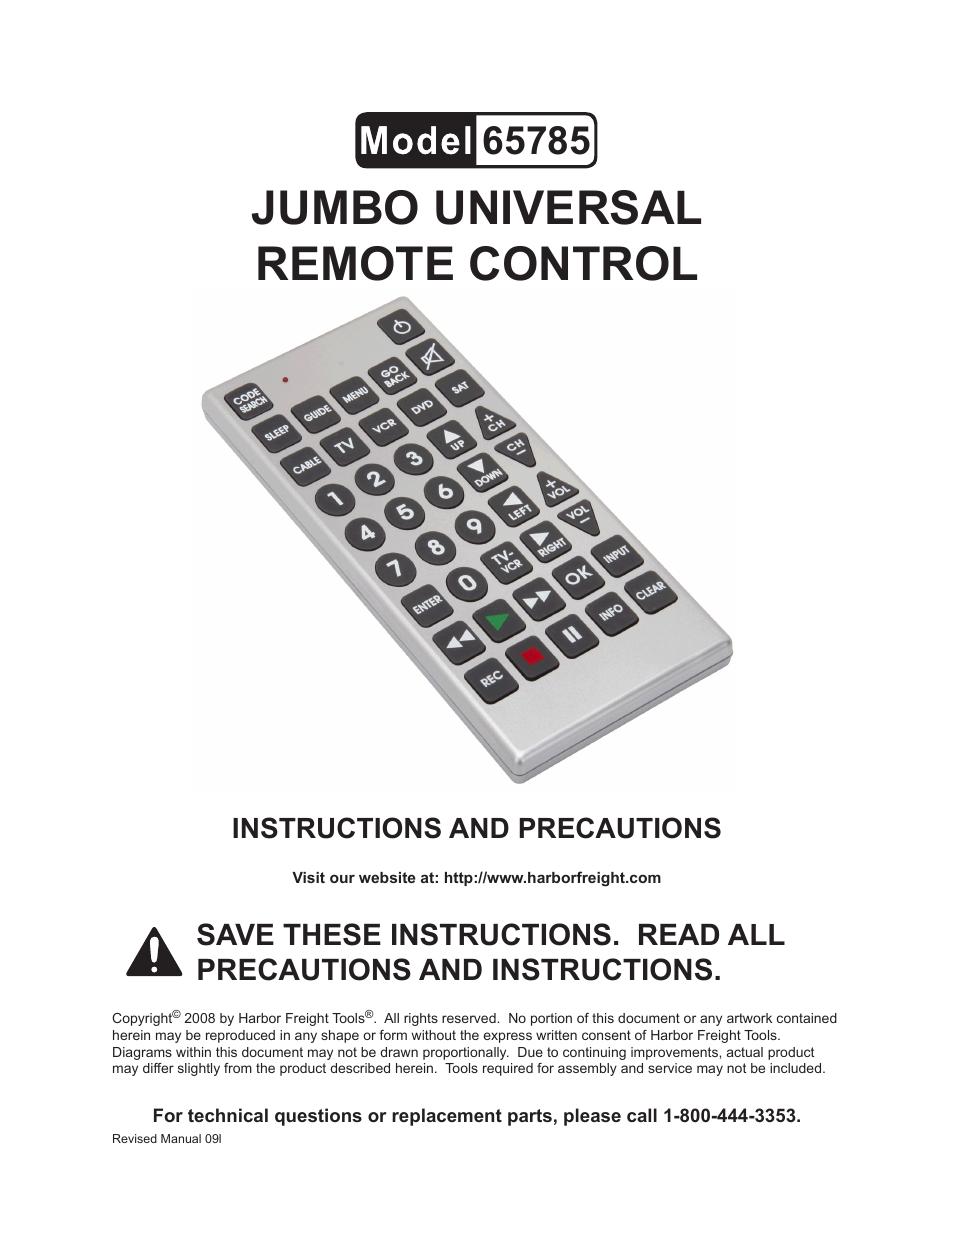 harbor freight tools jumbo universal remote control 65785 user rh manualsdir com quantum fx jumbo universal remote control codes emerson jumbo universal remote control codes